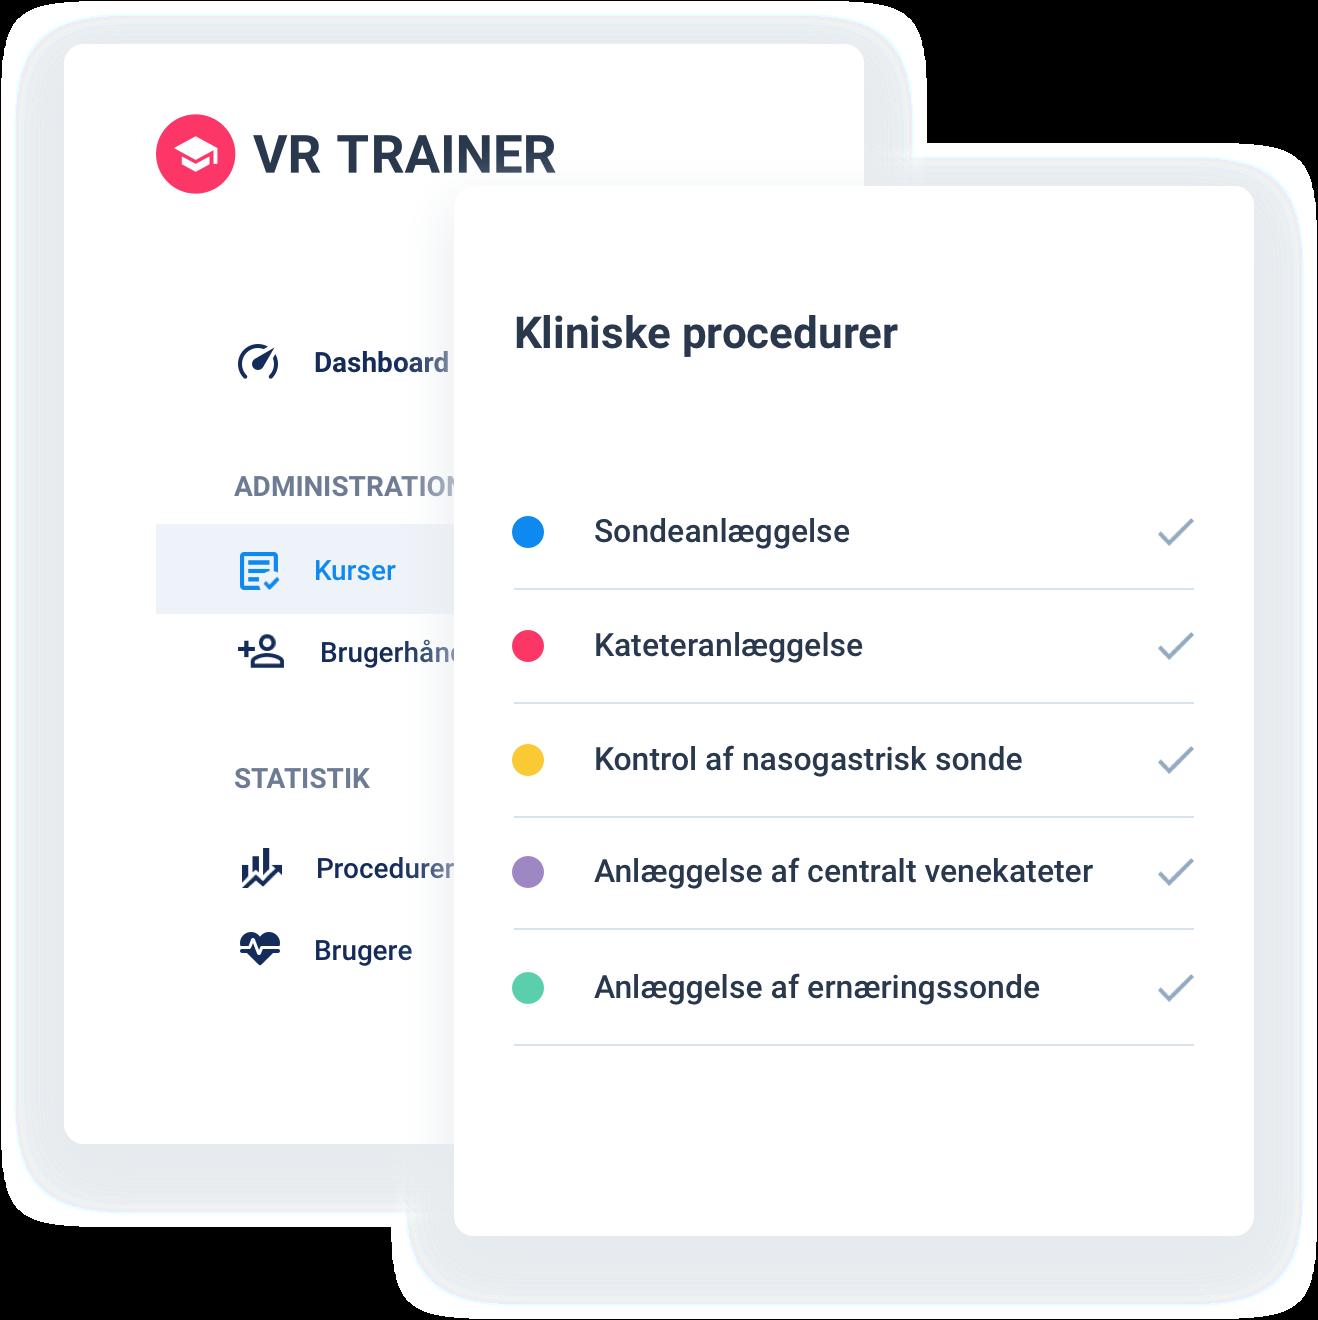 Kliniske procedurer - VR TRAINER